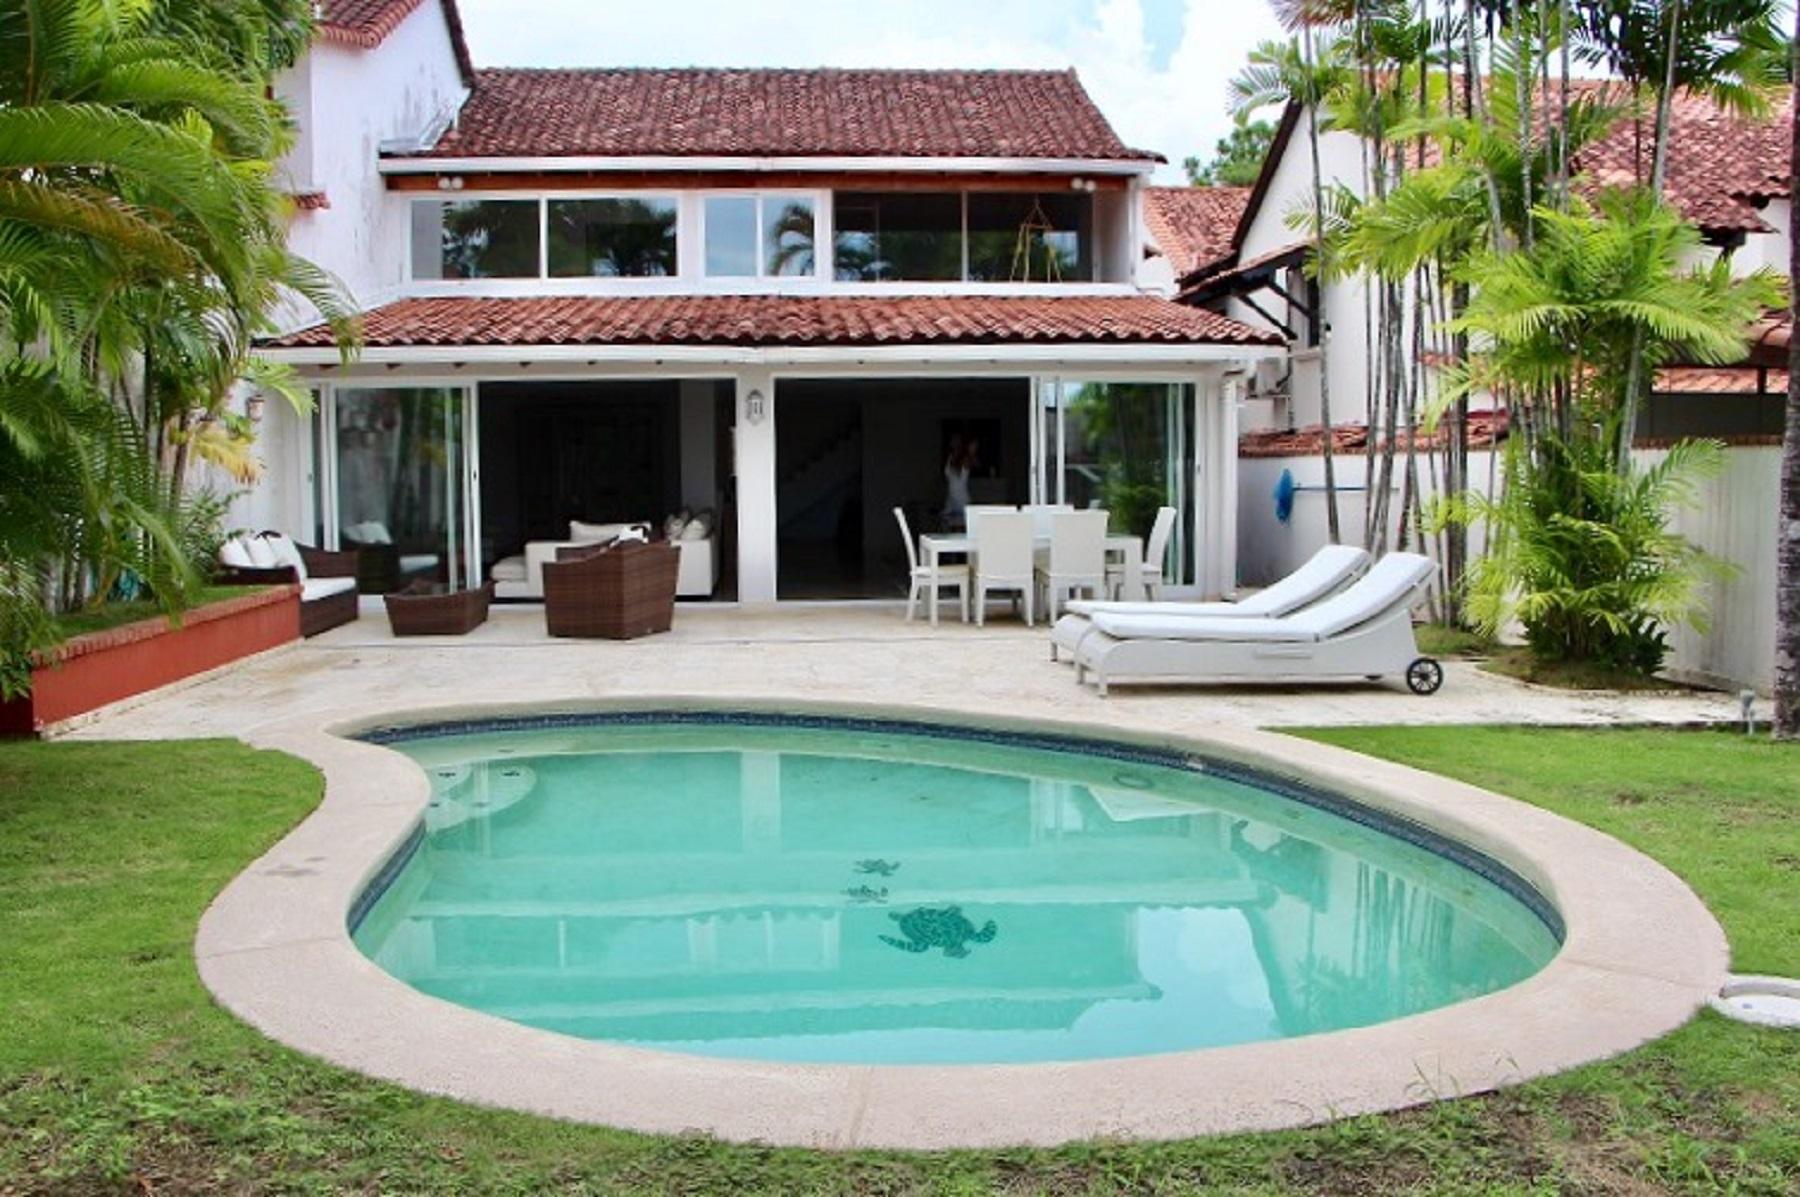 Duplex for Sale at Casa Diseño Europeo, Altos del Golf Panama City, Panama, Panama